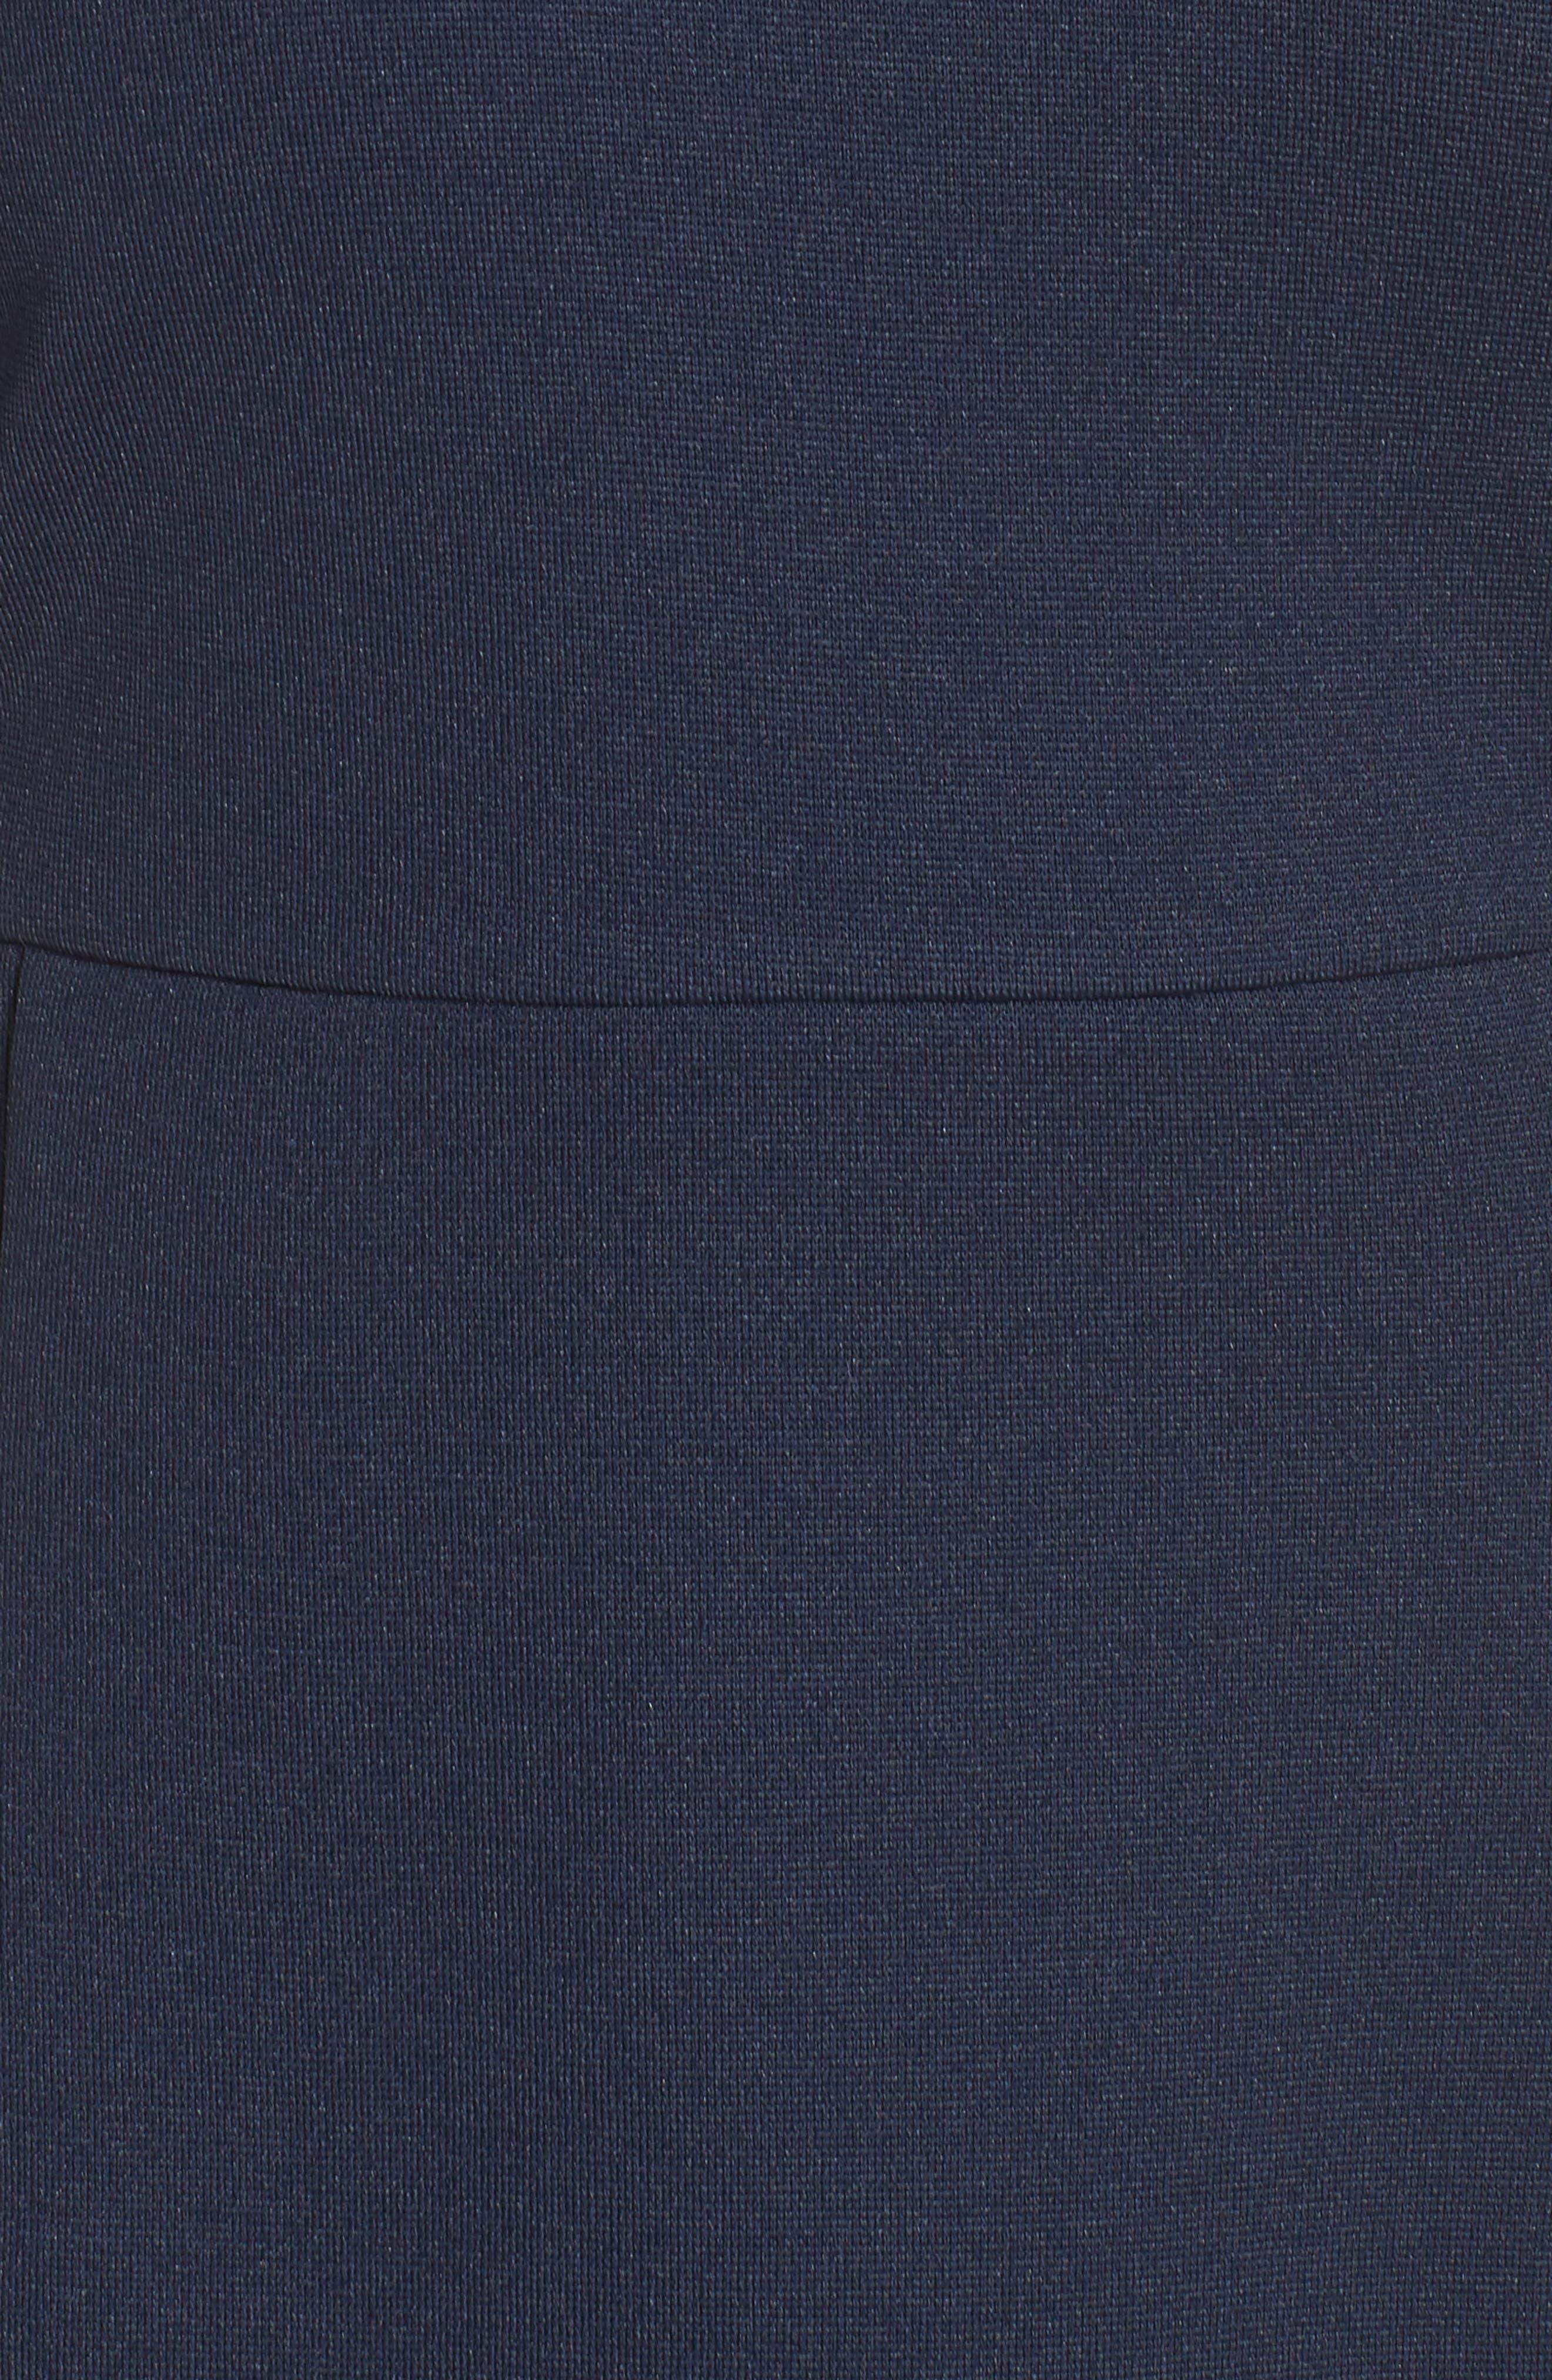 Sheath Dress,                             Alternate thumbnail 12, color,